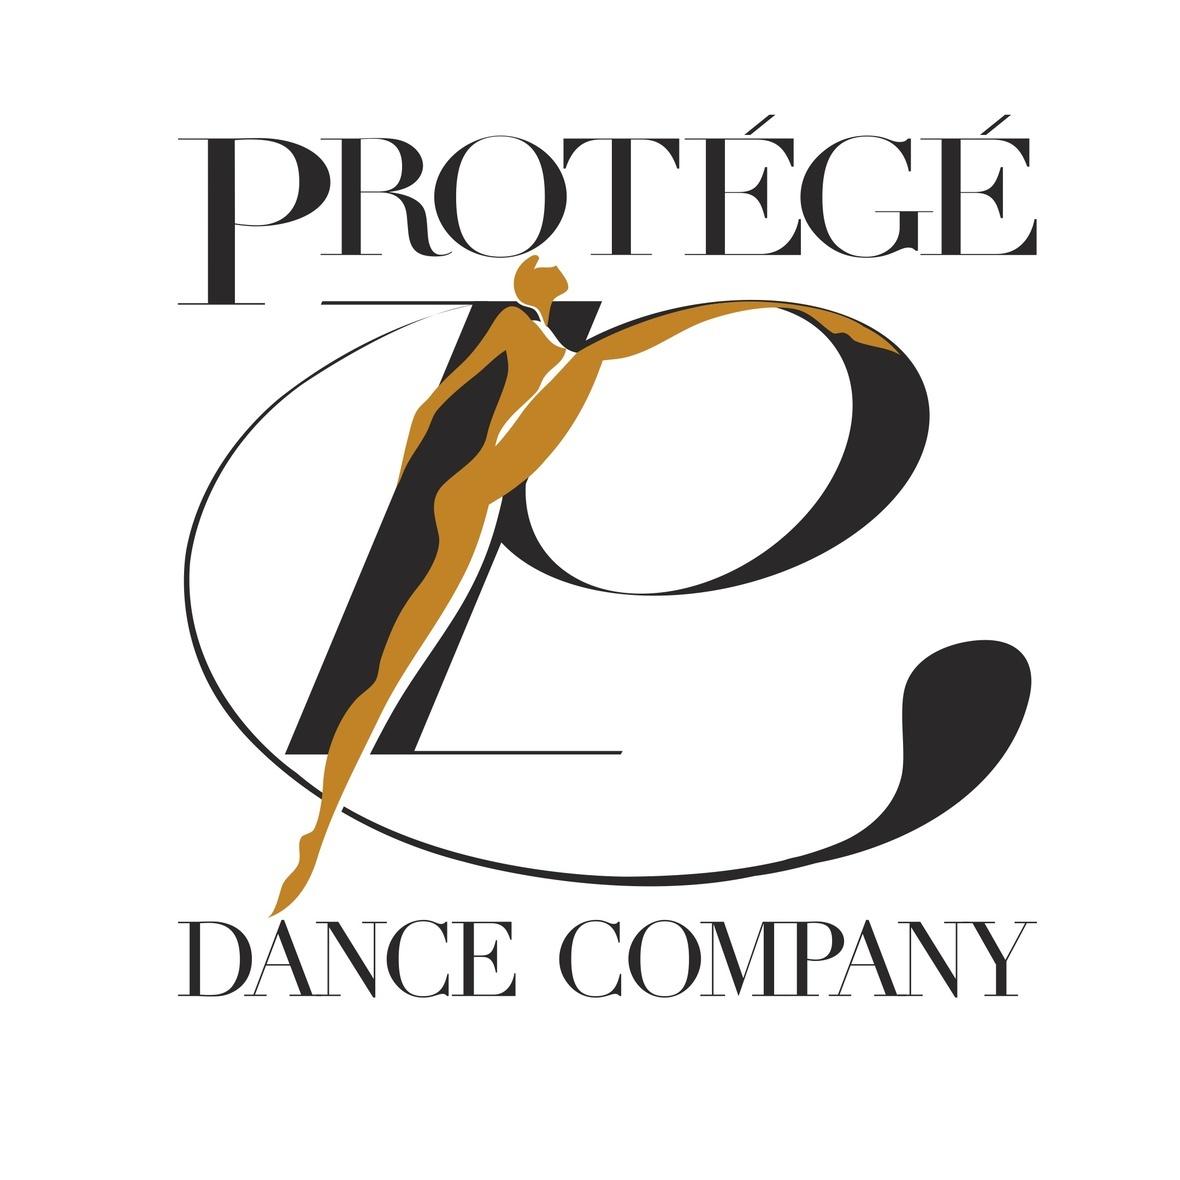 Protege Dance Company Logo